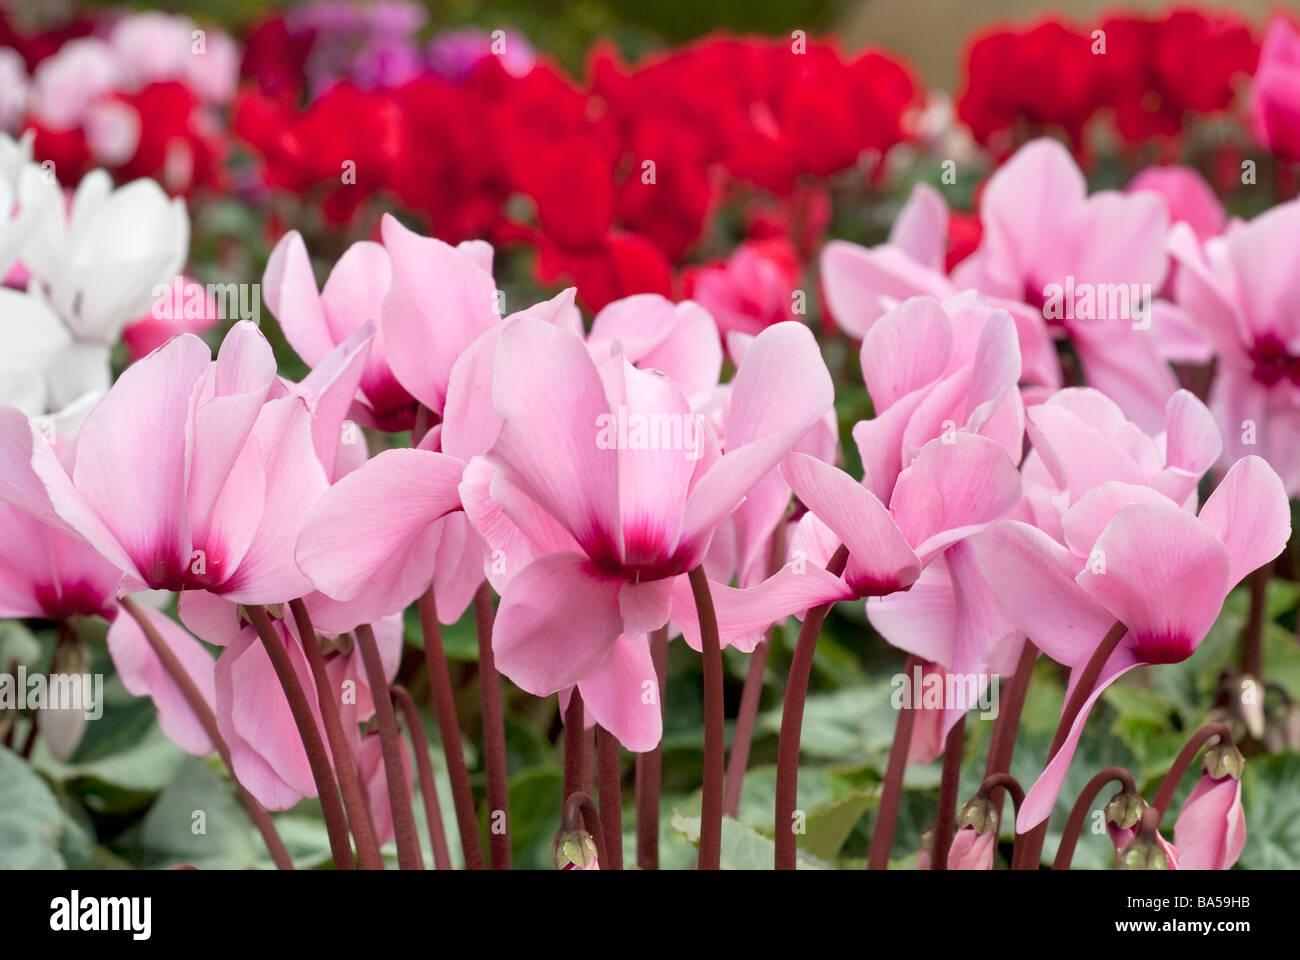 Cyclamen Cyclamen persicum, ciclamino, Primulaceae - Stock Image